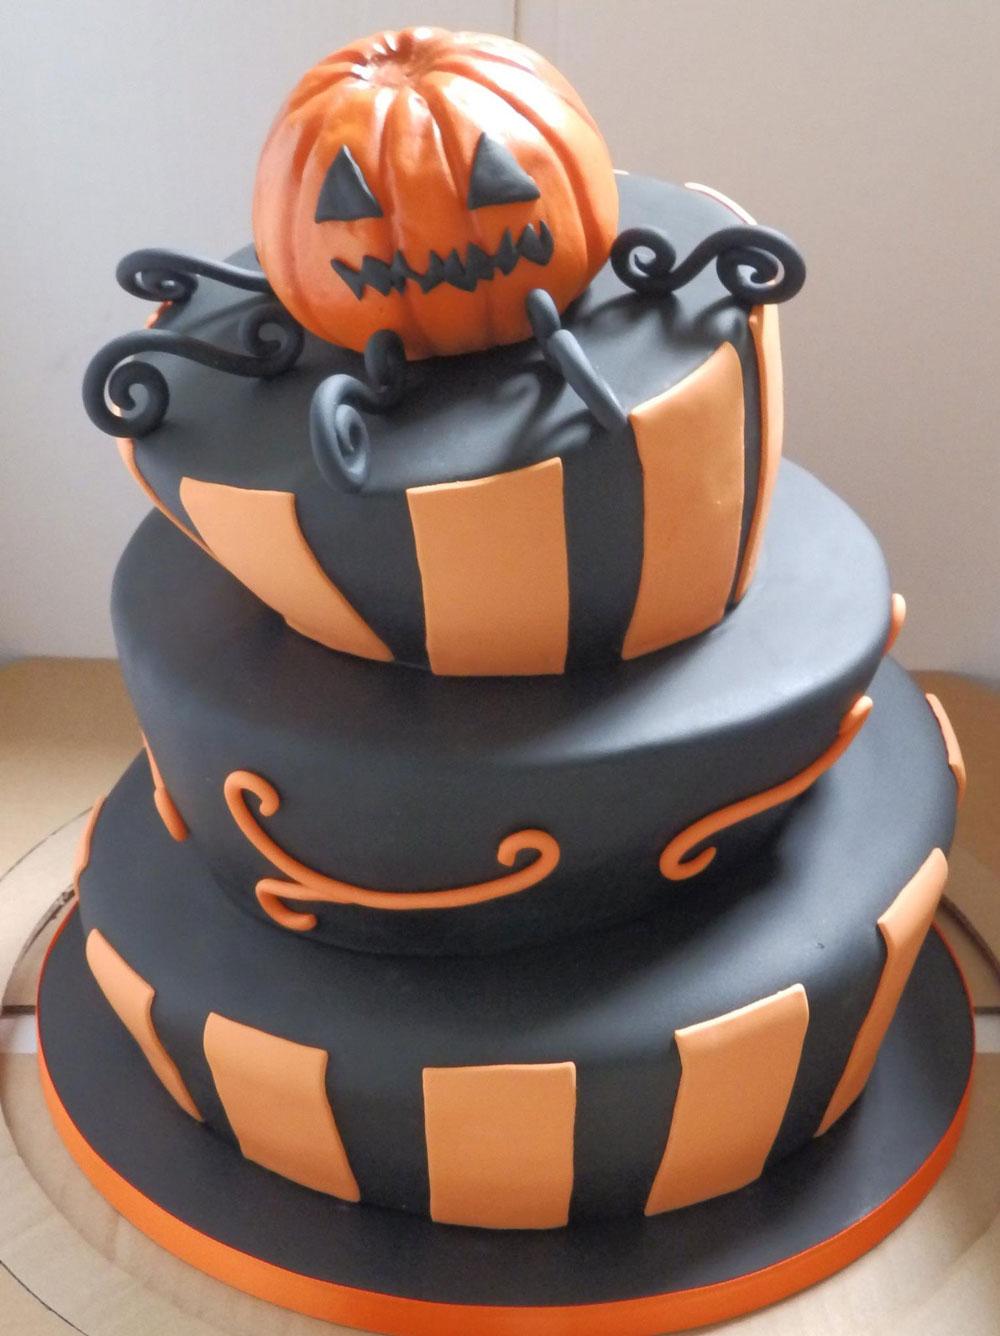 Celebrating Halloween Cake